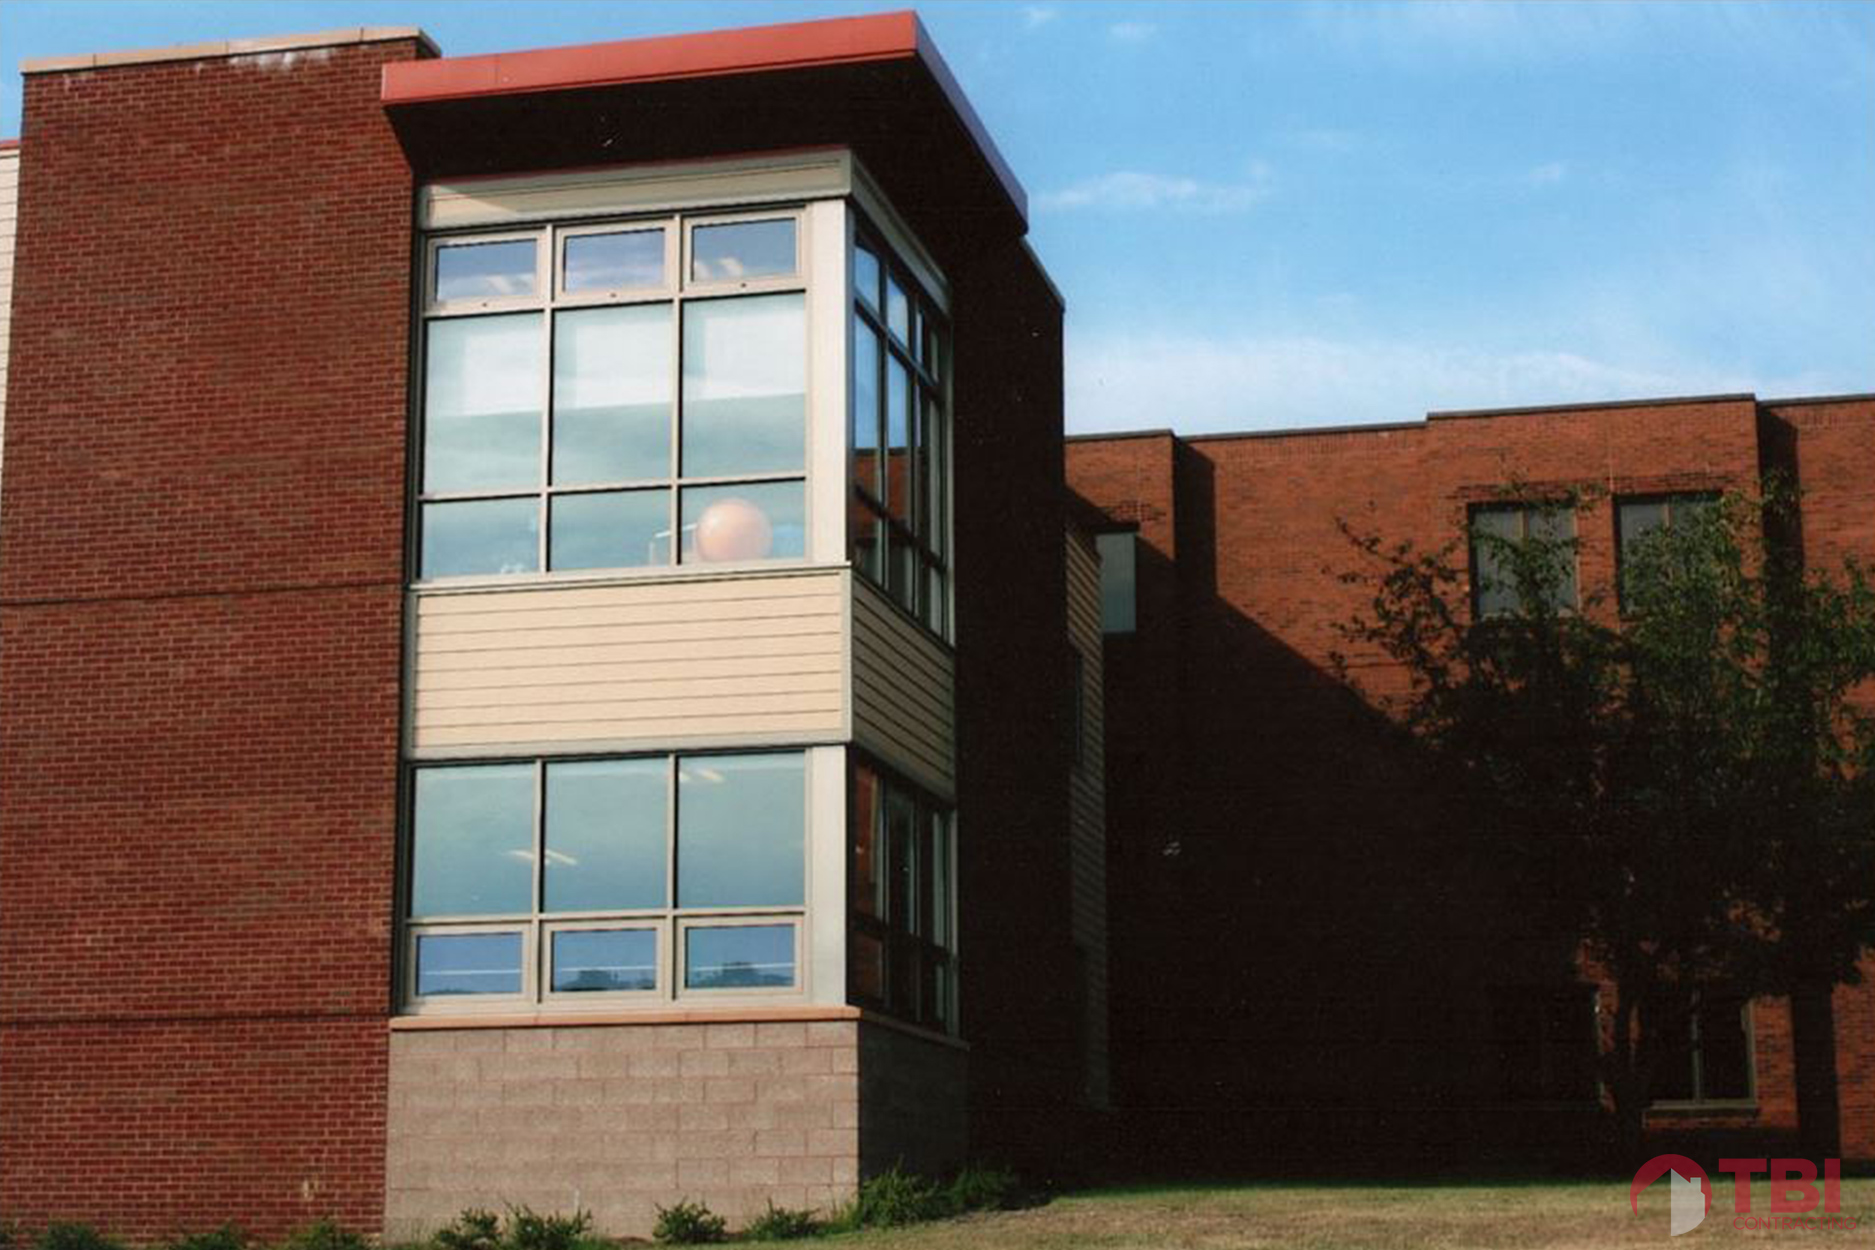 https://tbicontracting.com/wp-content/uploads/2015/05/washington-county-health-center-2.jpg